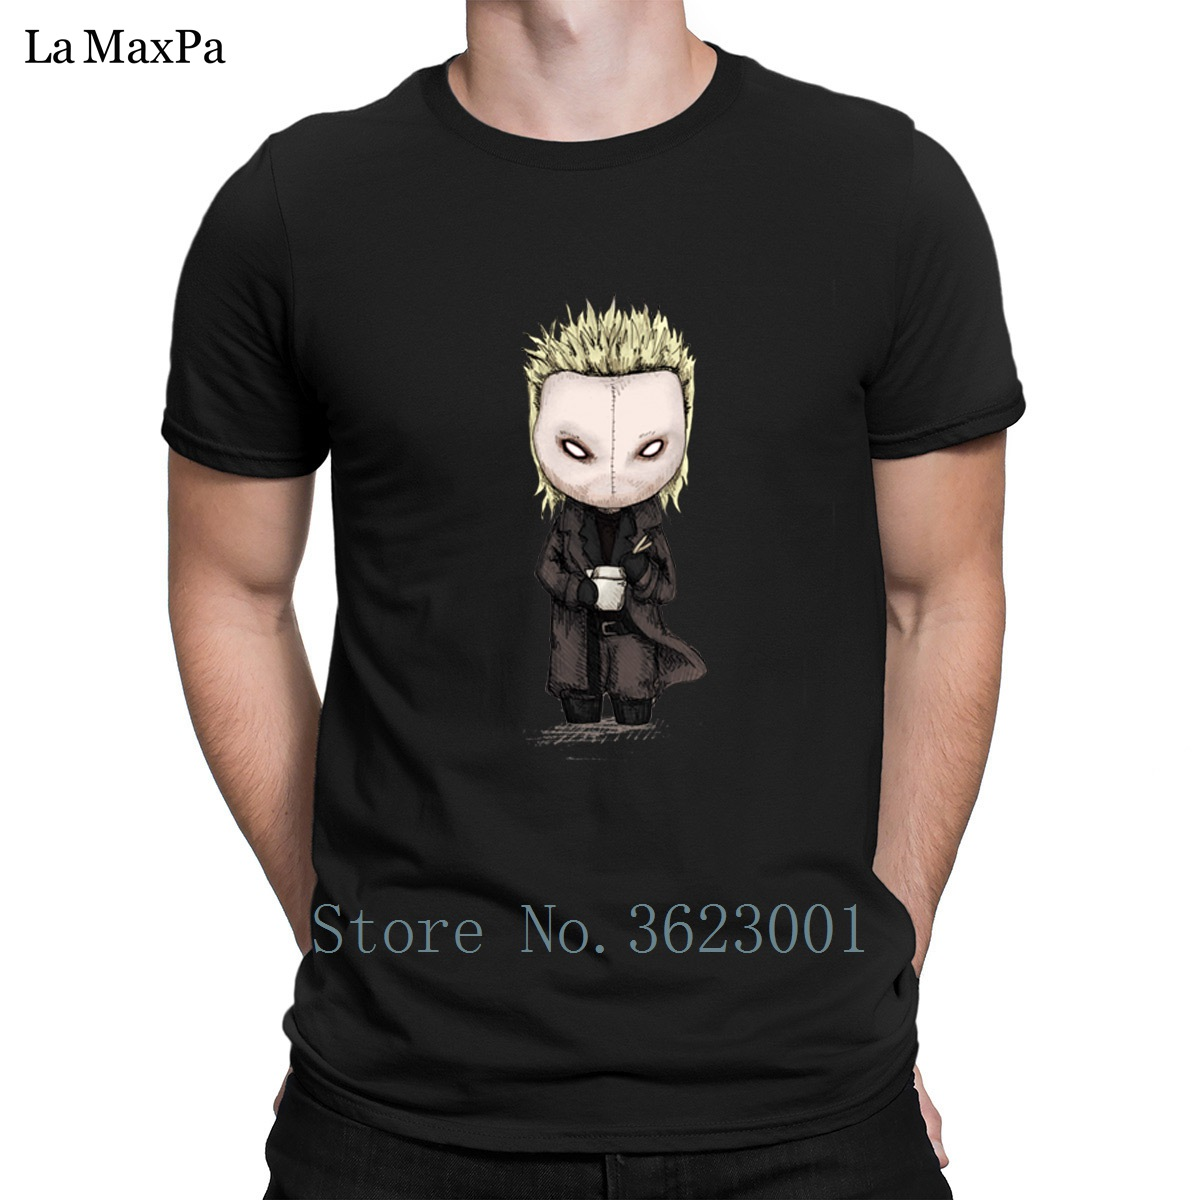 Create Comical Tee Shirt David Plushie Men Tshirt Outfit T-Shirt For Men Hilarious T Shirt Mens Plus Size High Quality